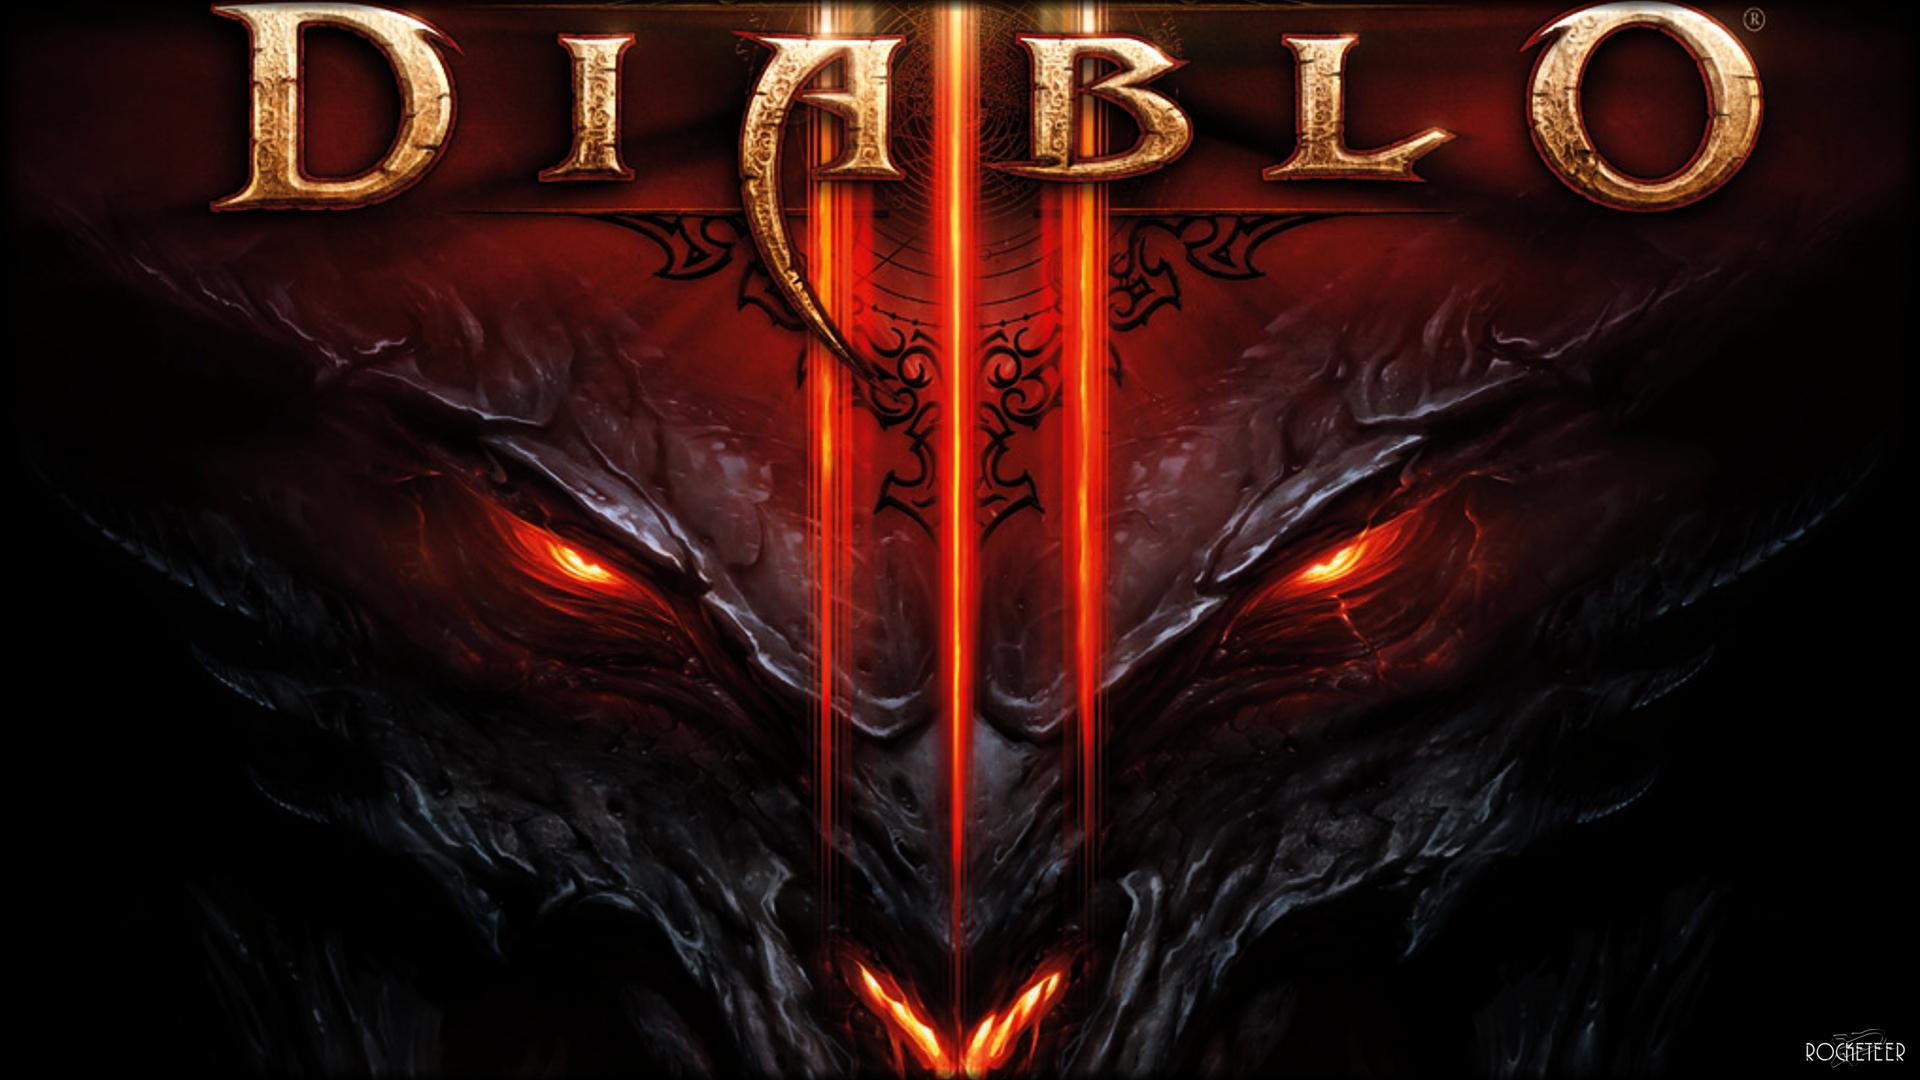 47 Diablo 3 Hd Wallpapers Widescreen On Wallpapersafari